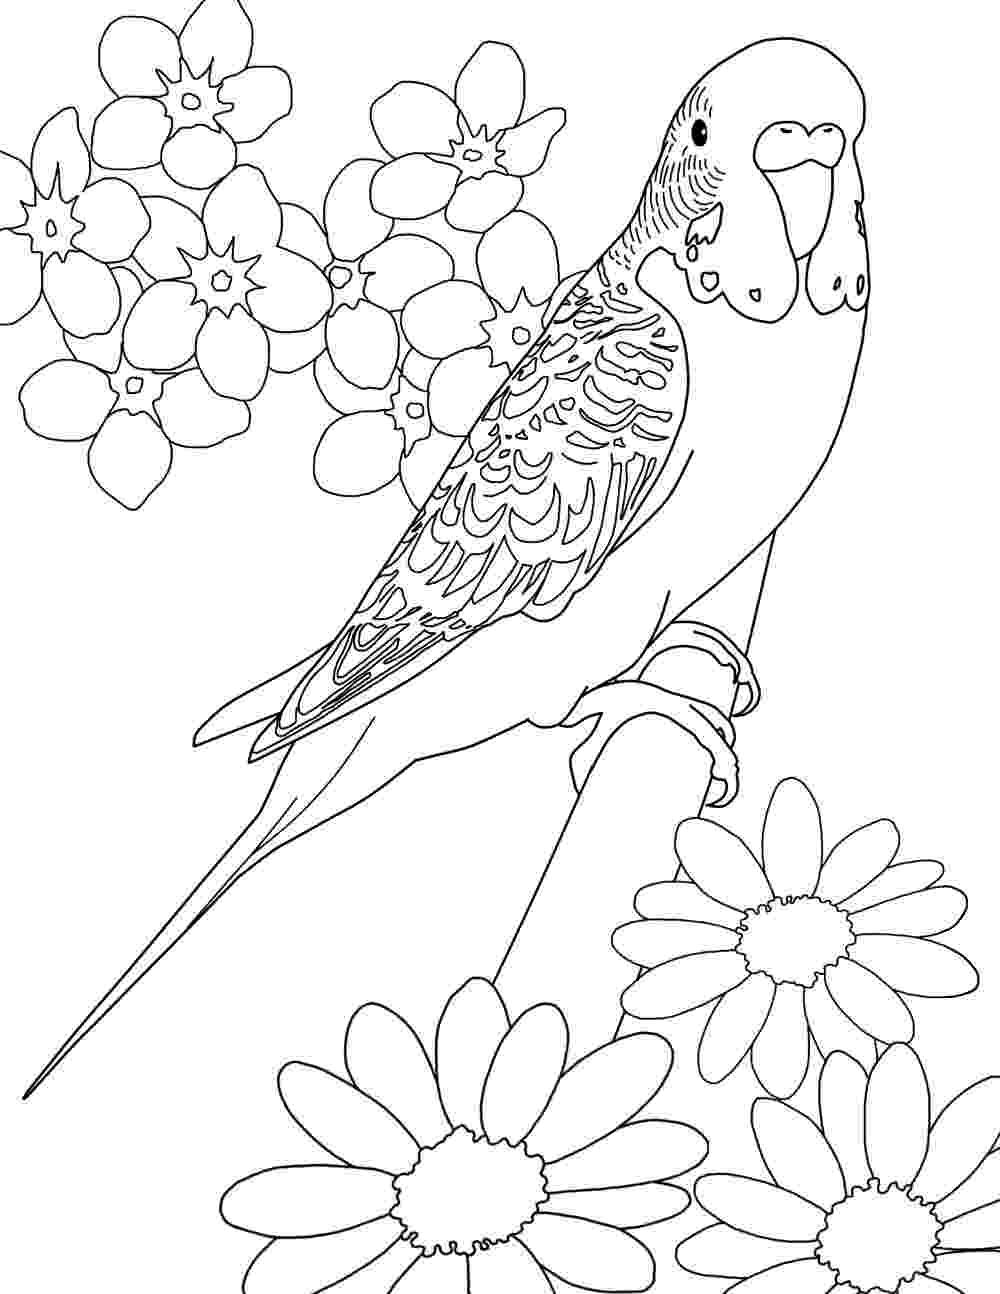 parakeet coloring pages parakeet coloring pages my parakeet clarabelle pages parakeet coloring